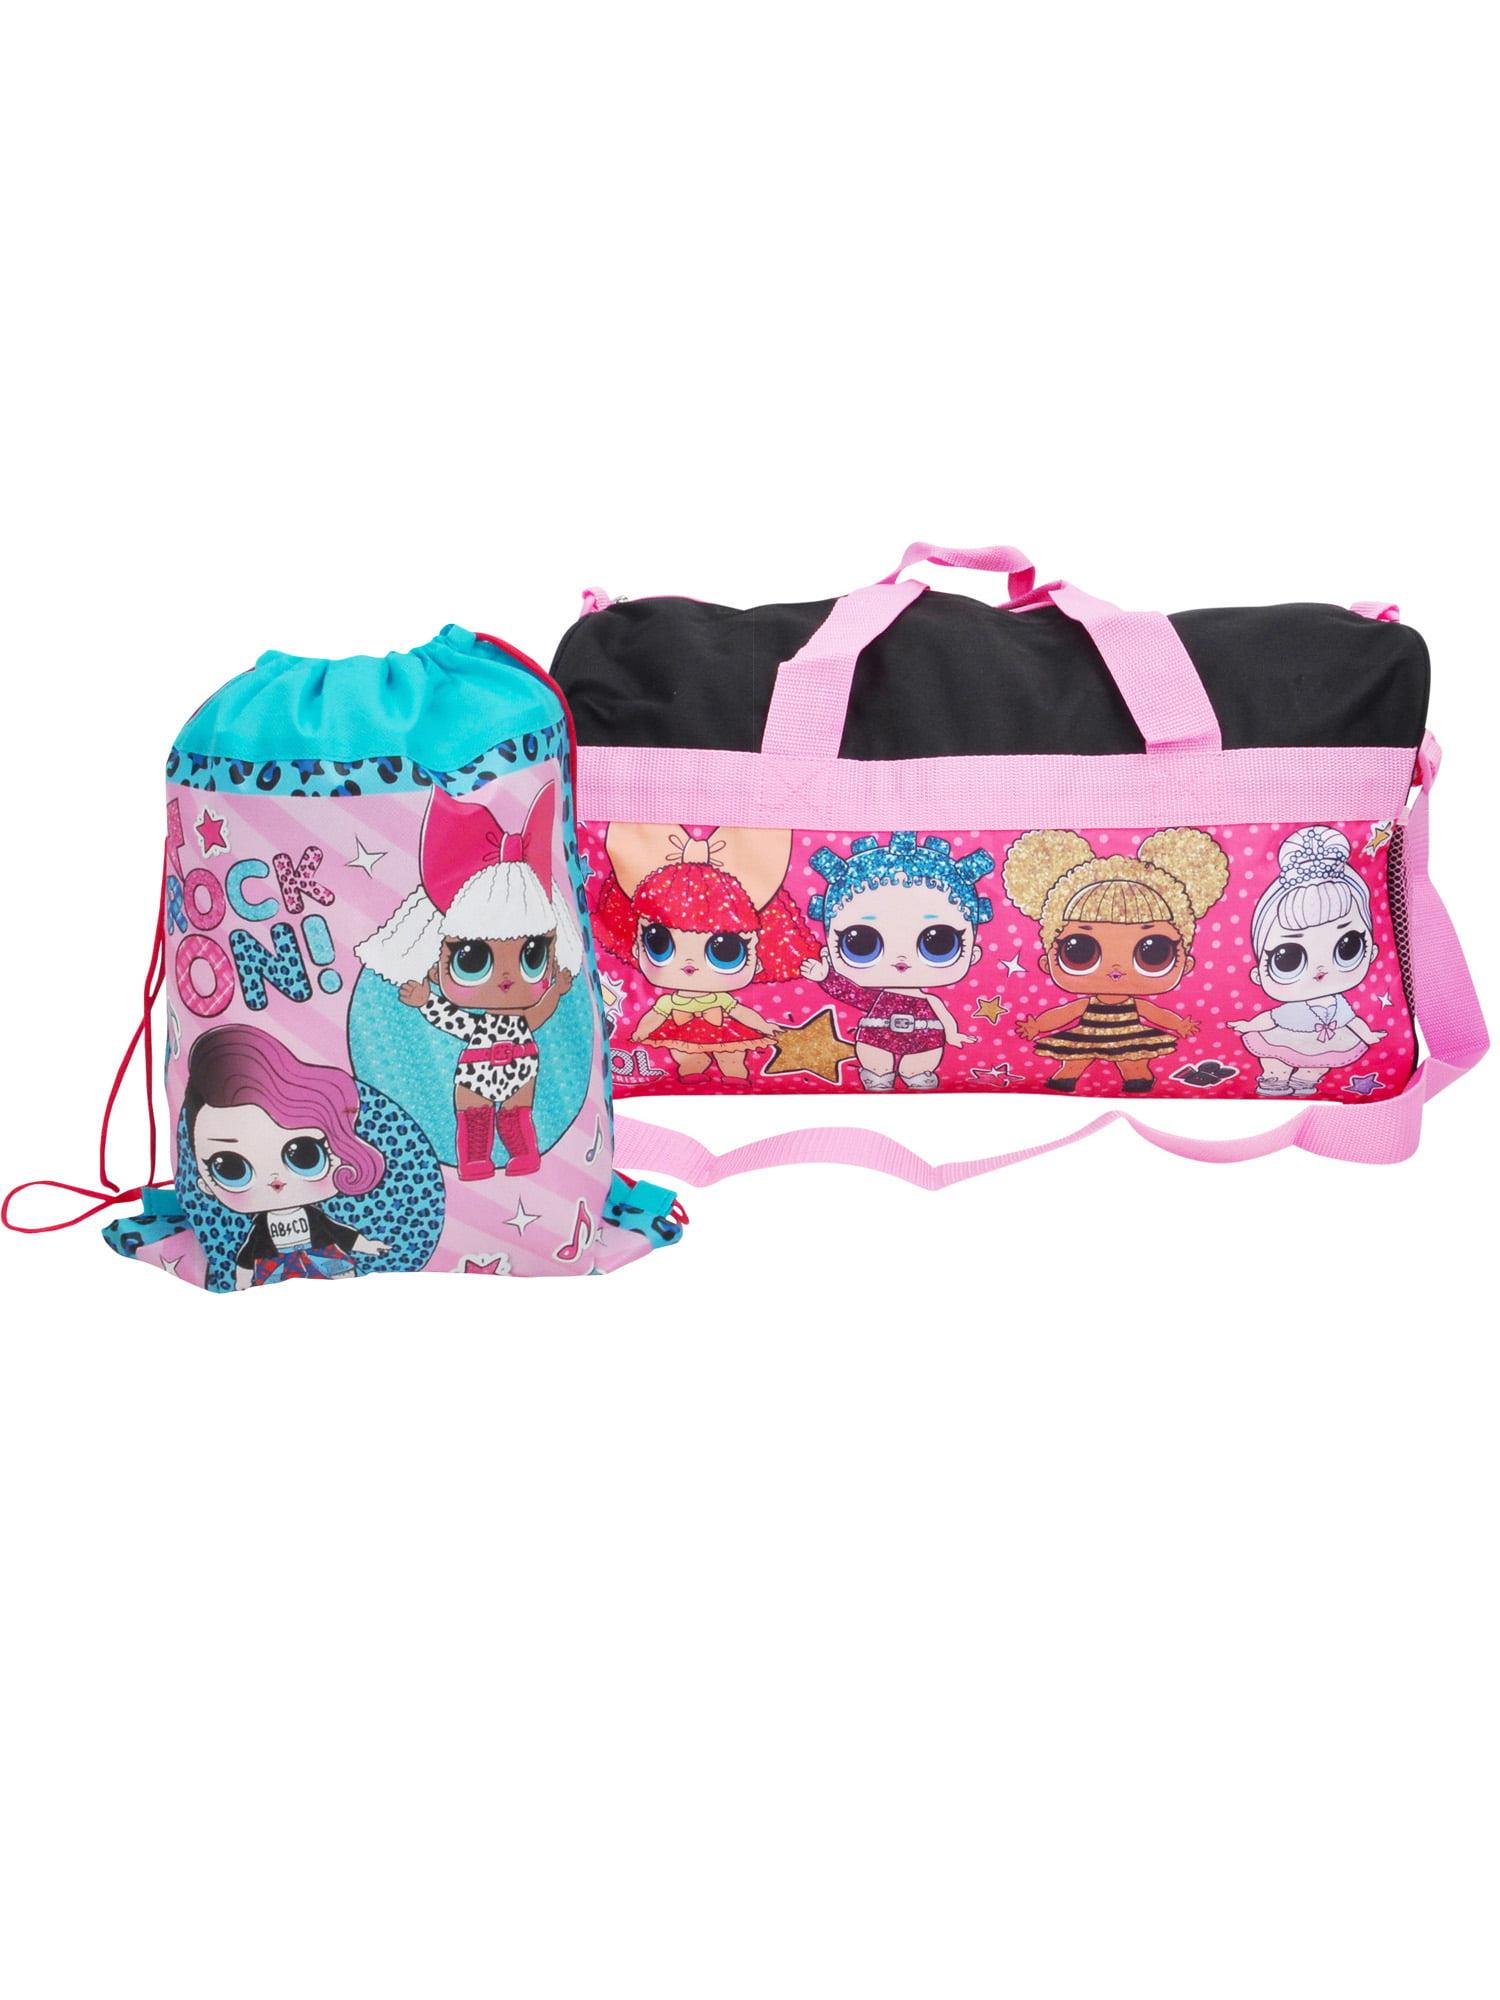 87c1f1a382 Girls LOL Surprise Duffel Bag Black   Sling Bag 2-Piece - Walmart.com